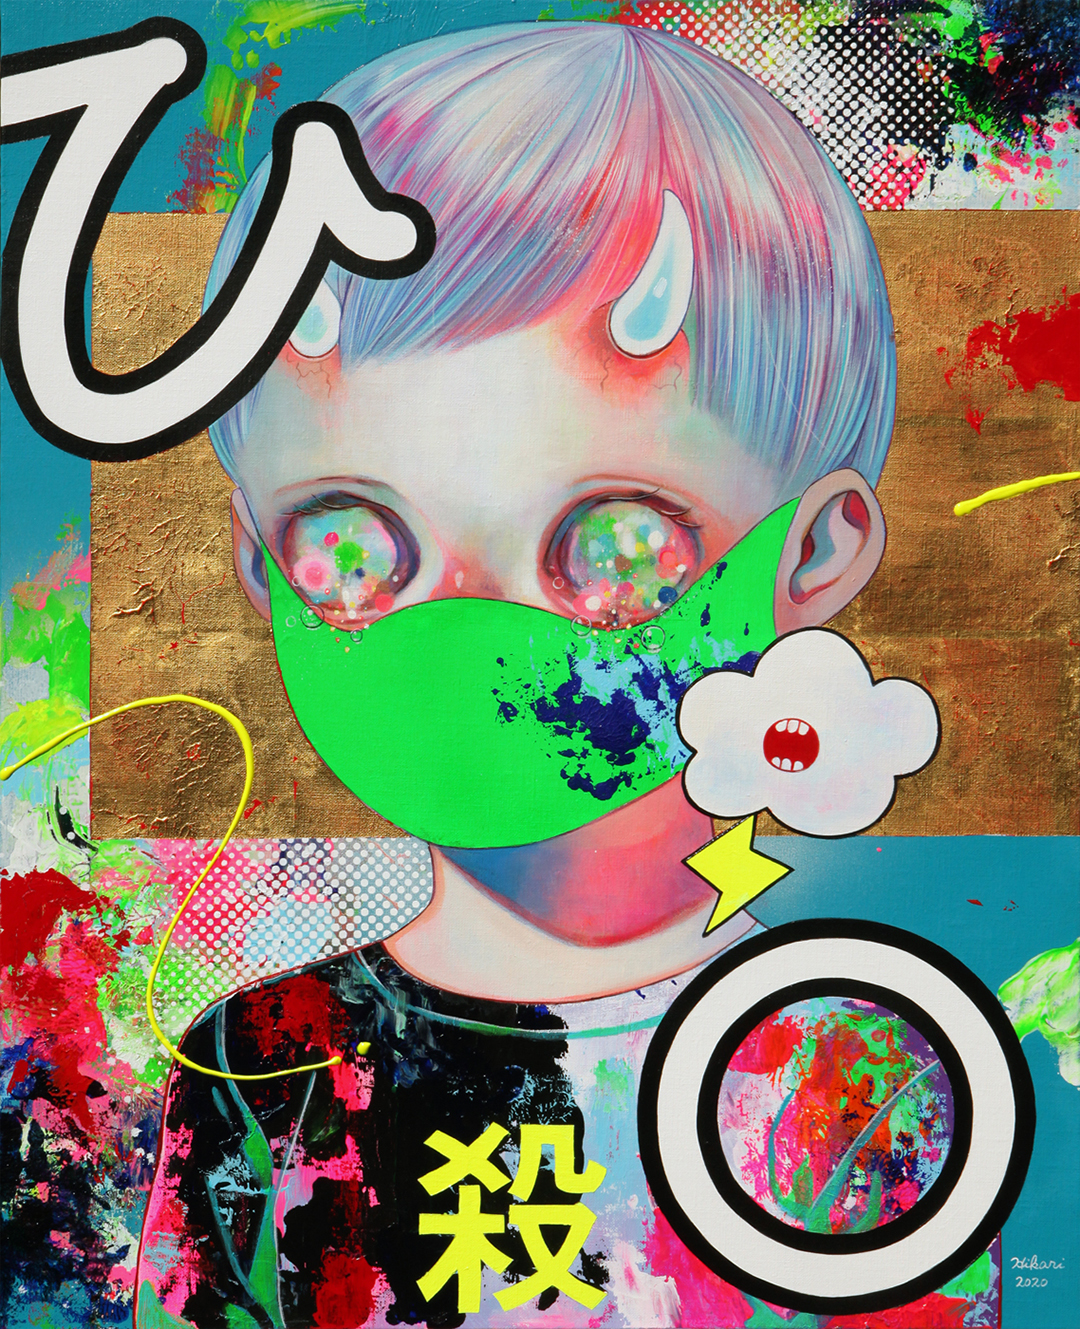 GirlsclubAsia-Artist-Hikari Shimoda_People with Intentions #3_Acrylic, oil, gold leaf on canvas_25.7 x 20.9